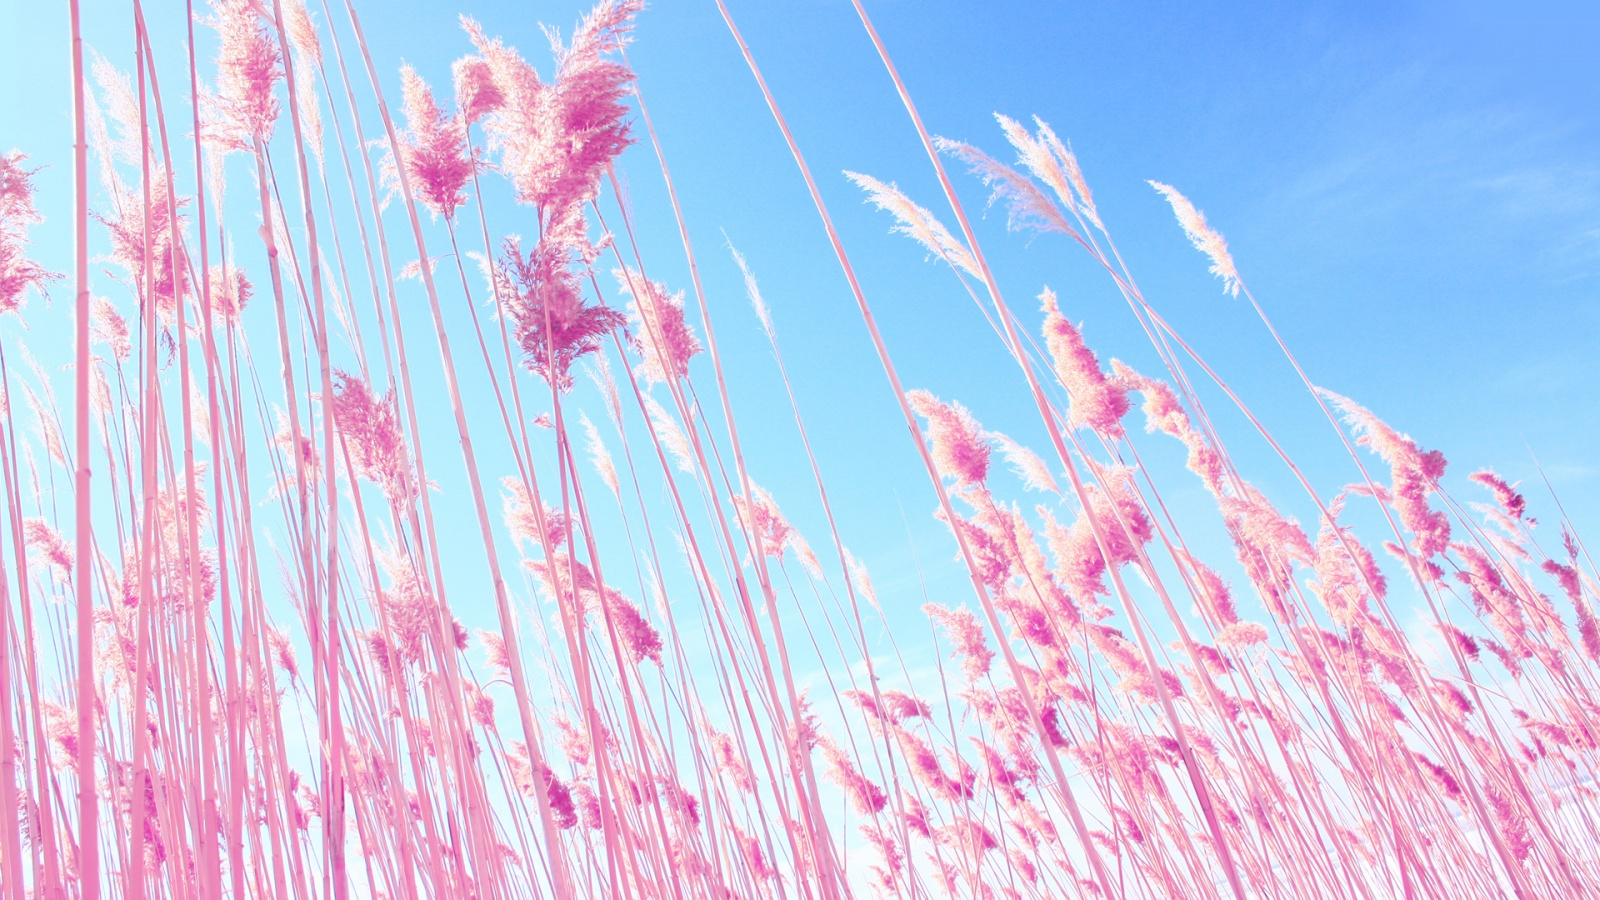 Vs Pink Desktop Wallpaper   HD Wallpapers 1600x900